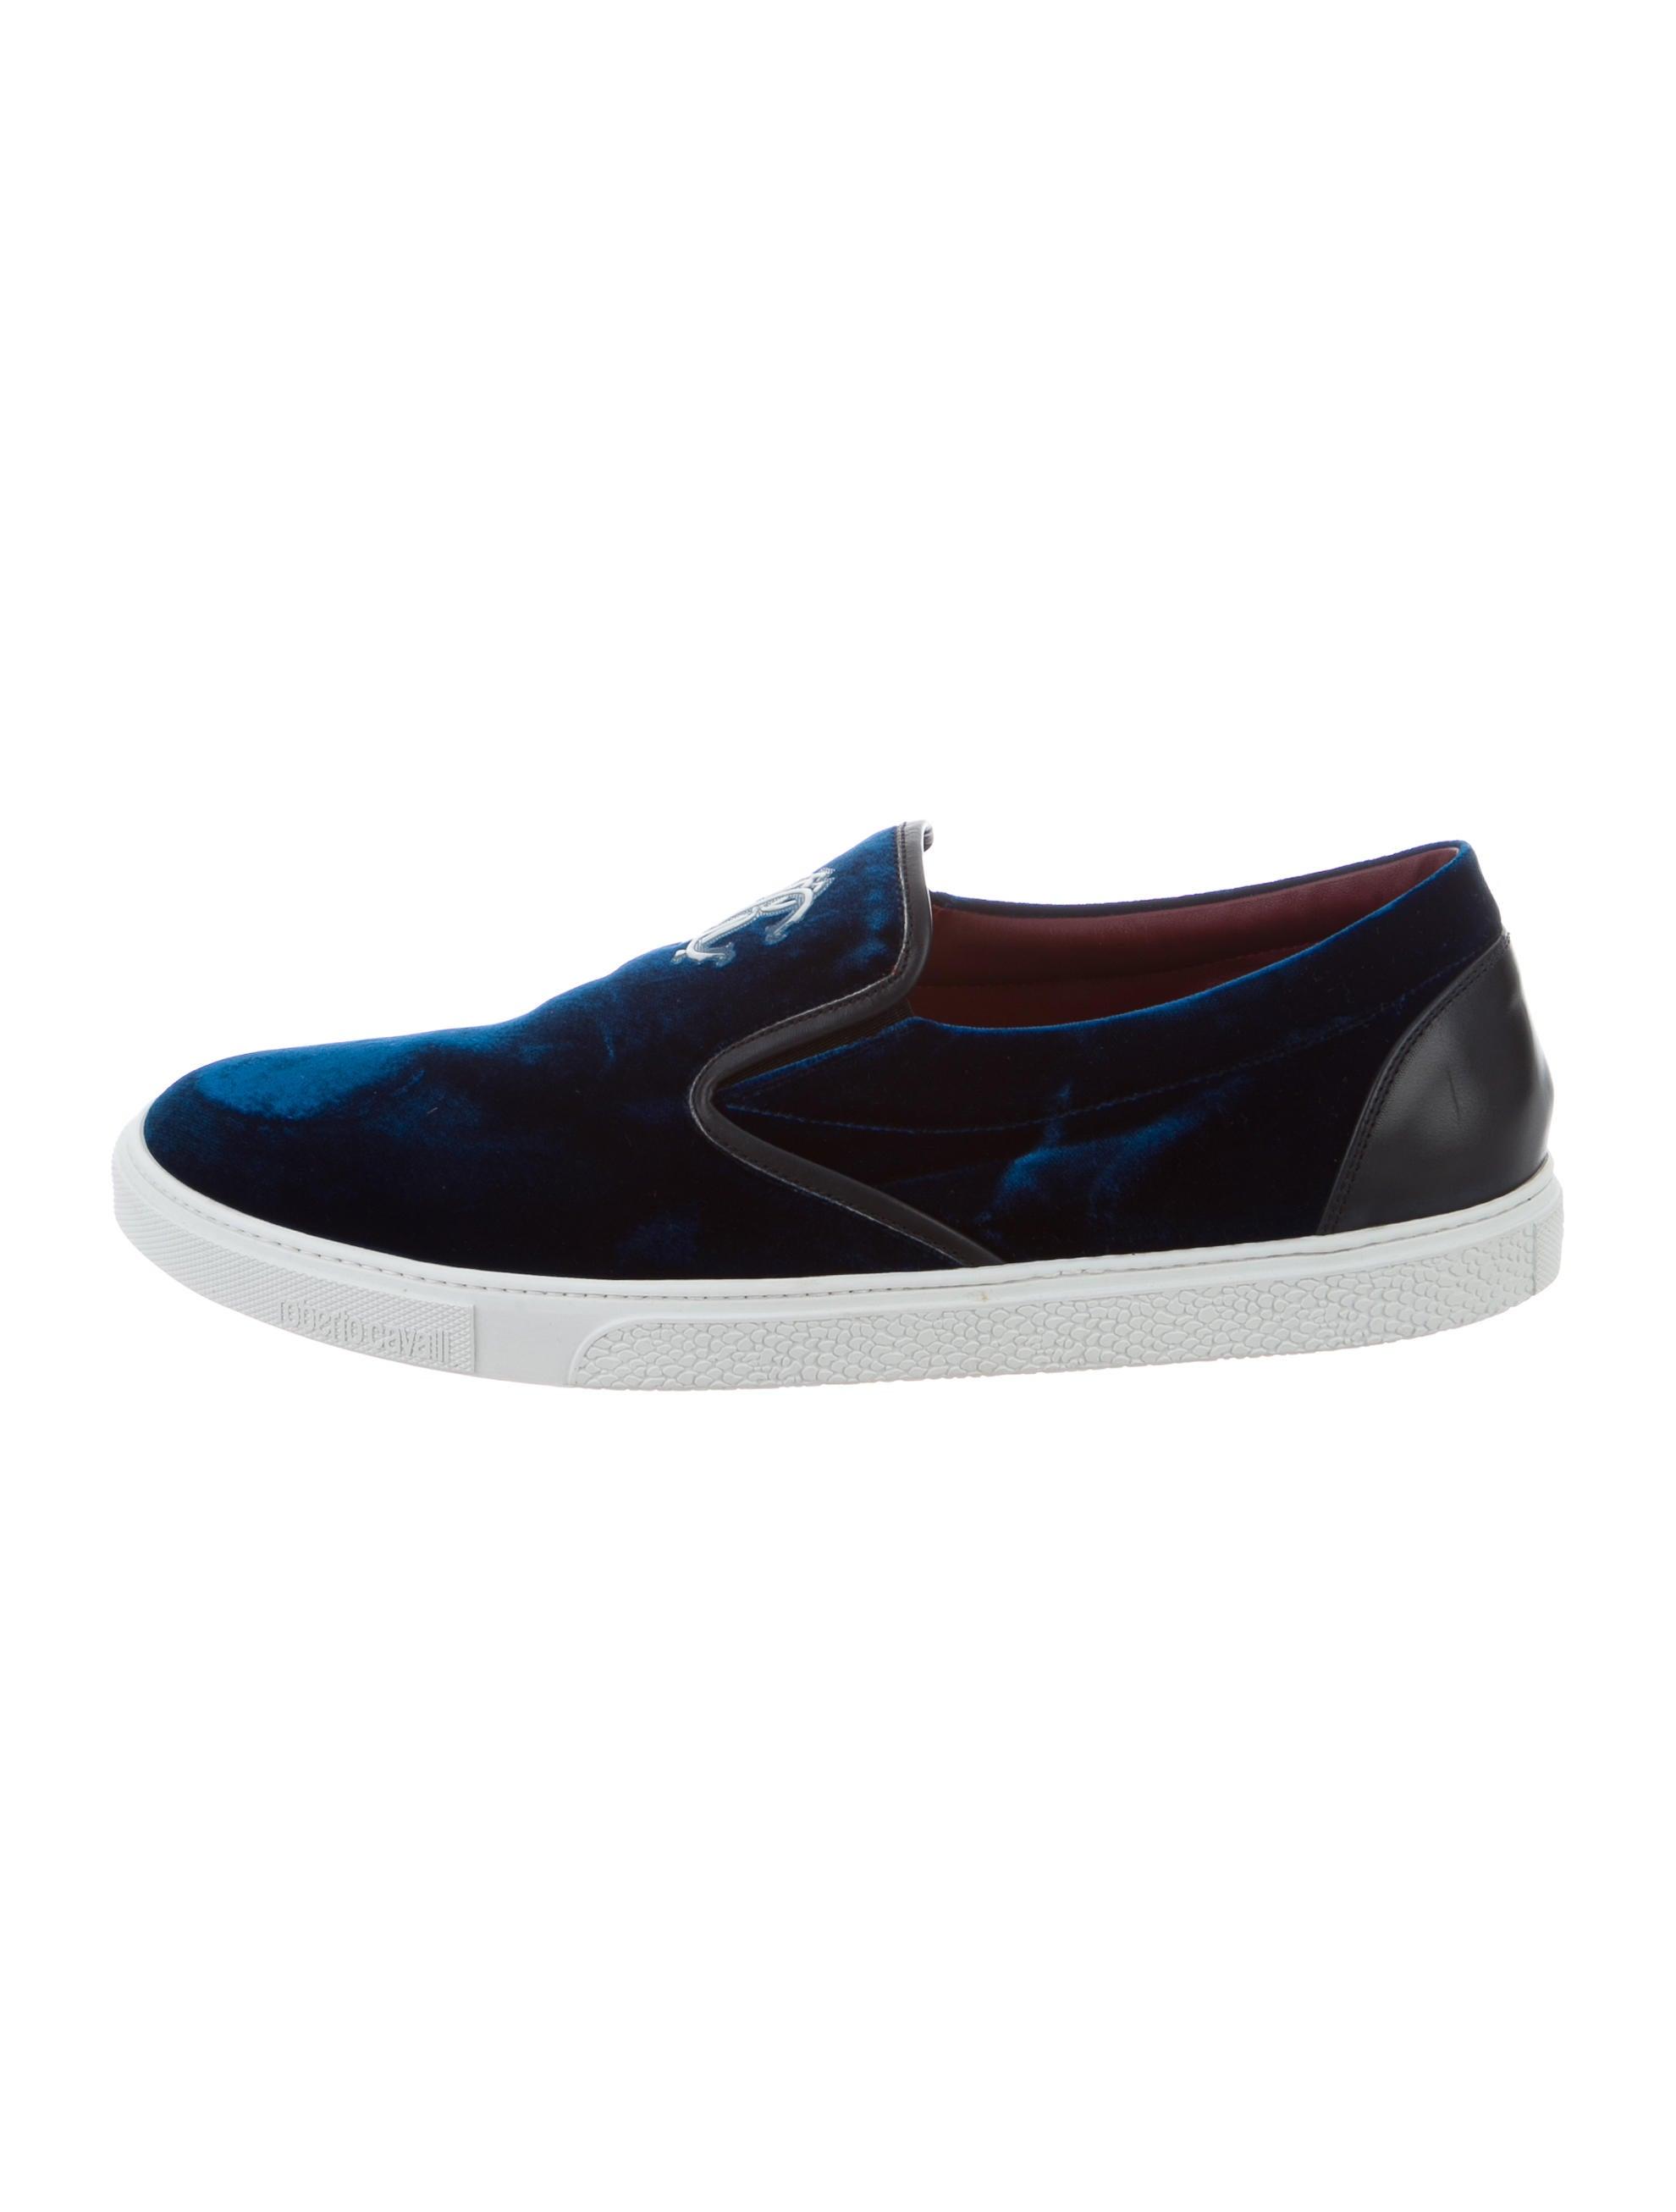 roberto cavalli velvet slip on sneakers shoes rob41473